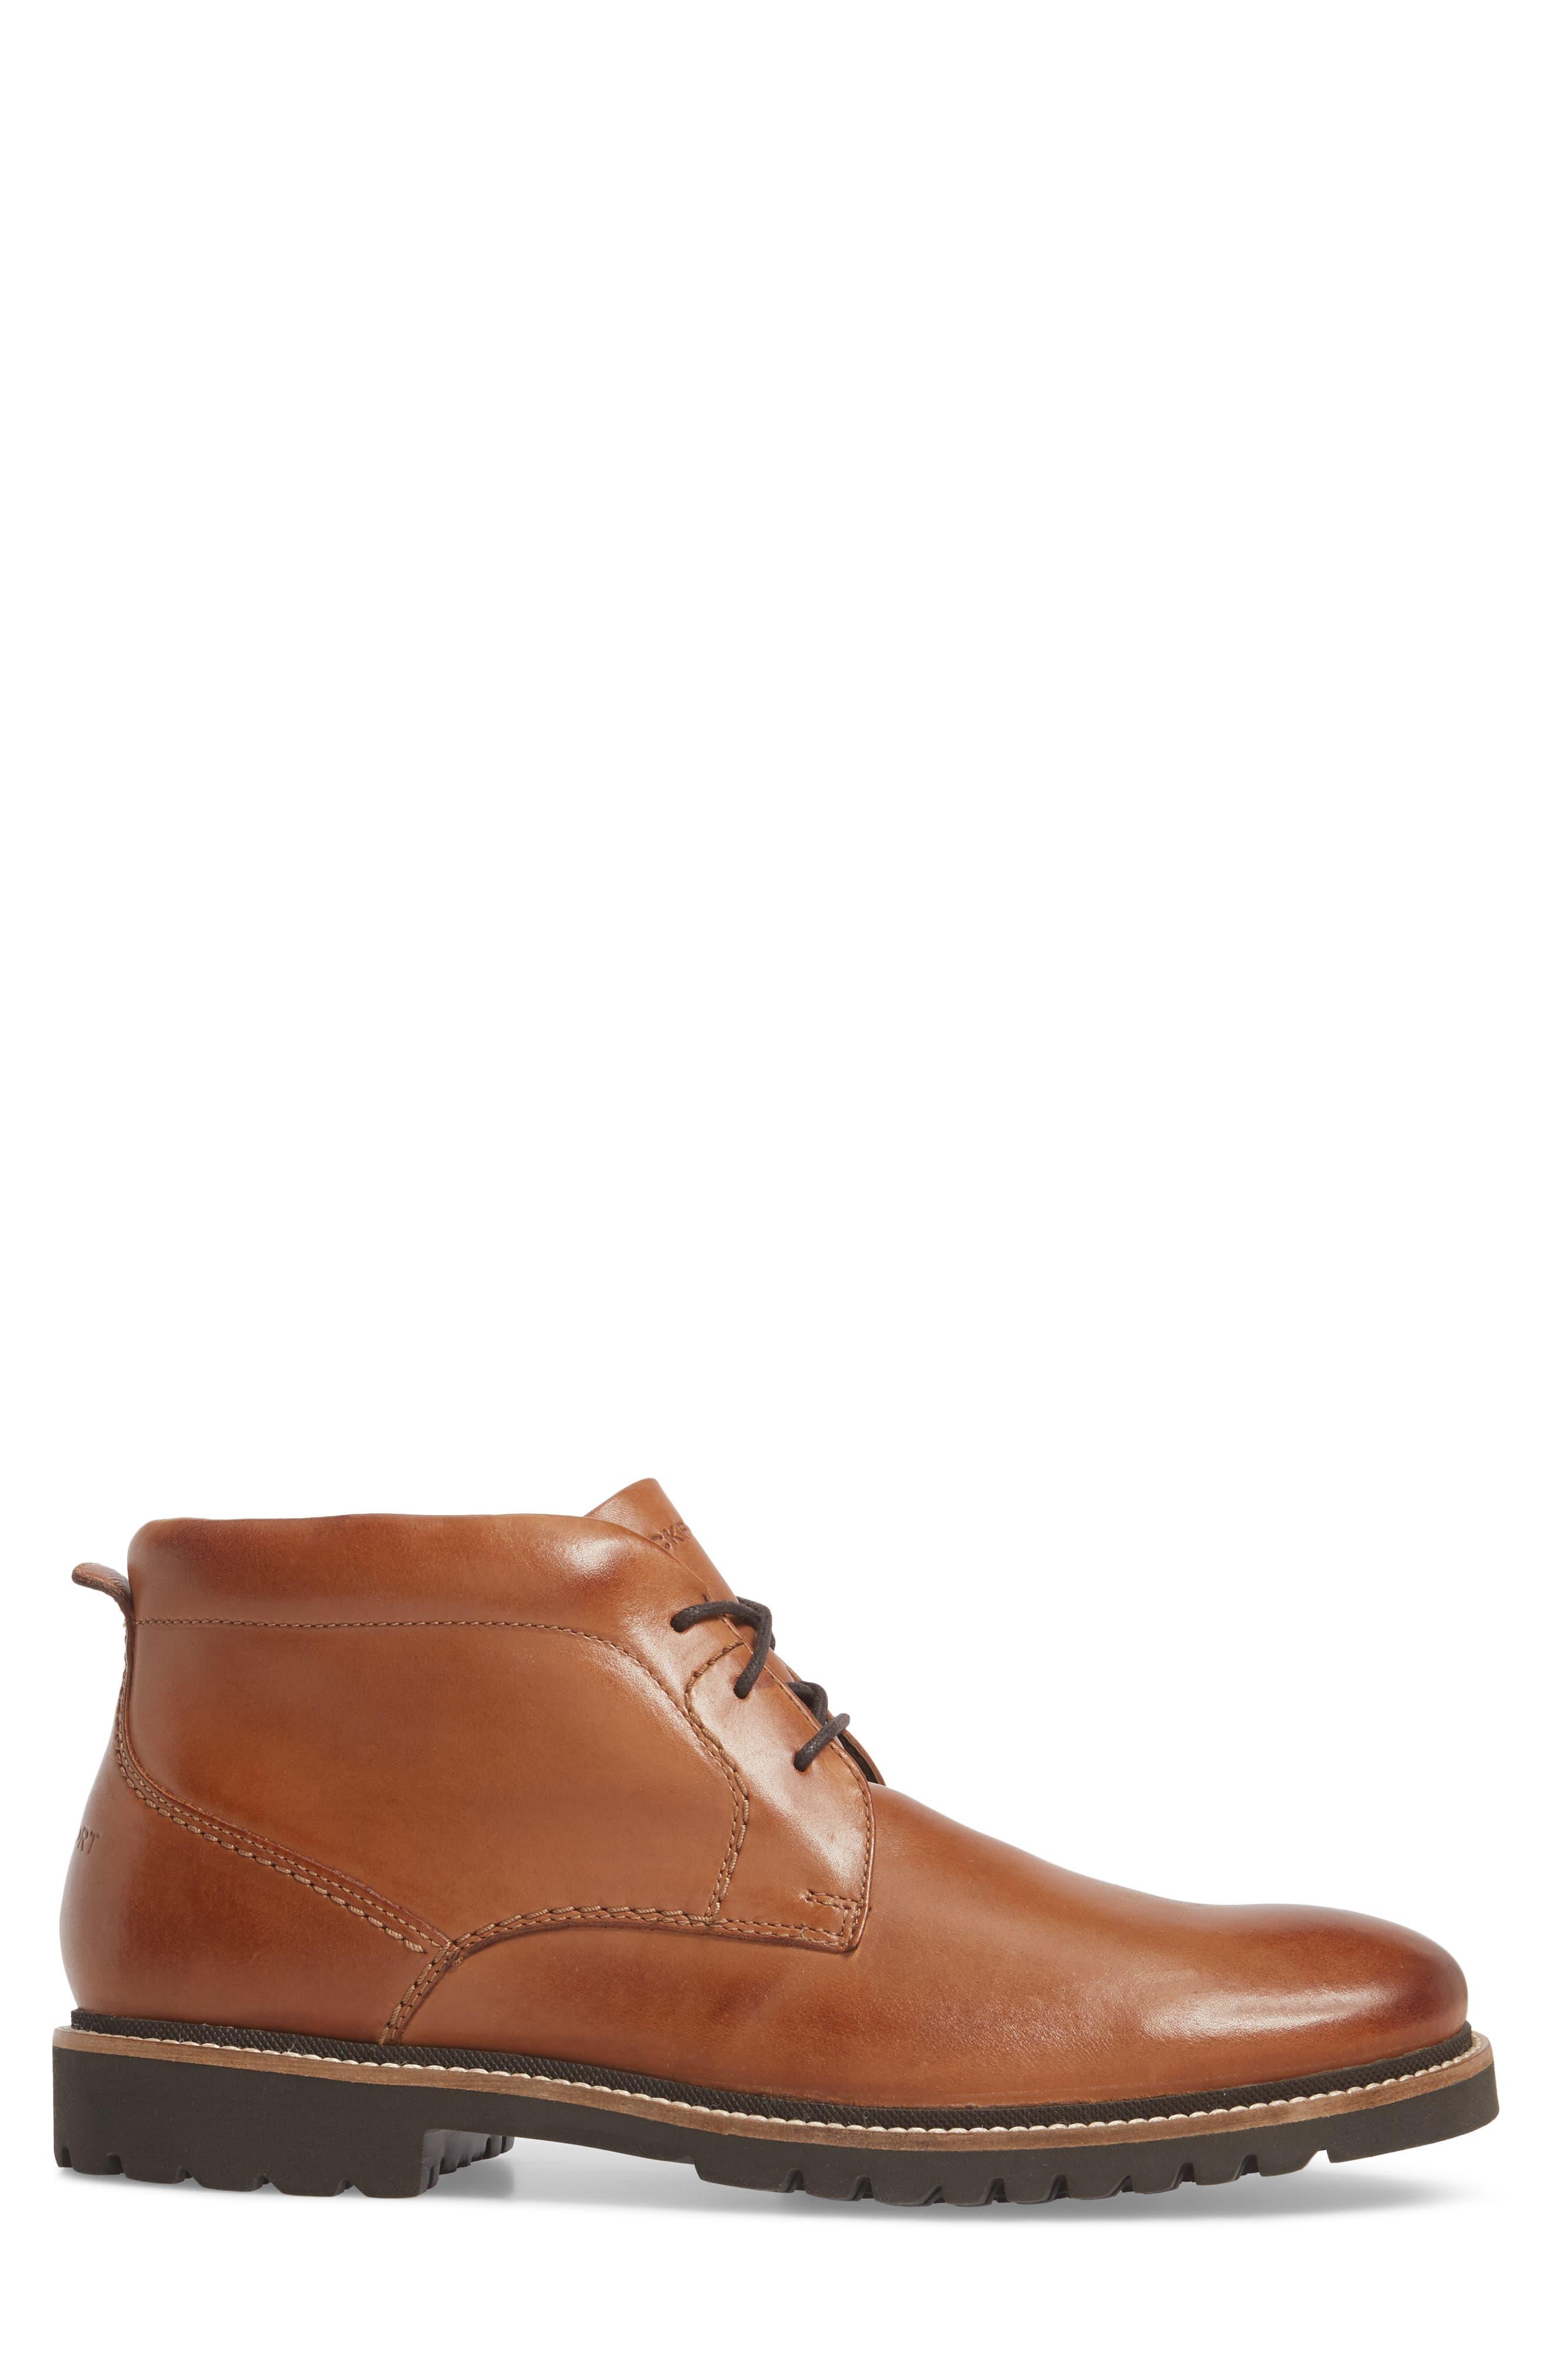 Marshall Chukka Boot,                             Alternate thumbnail 3, color,                             Cognac Leather